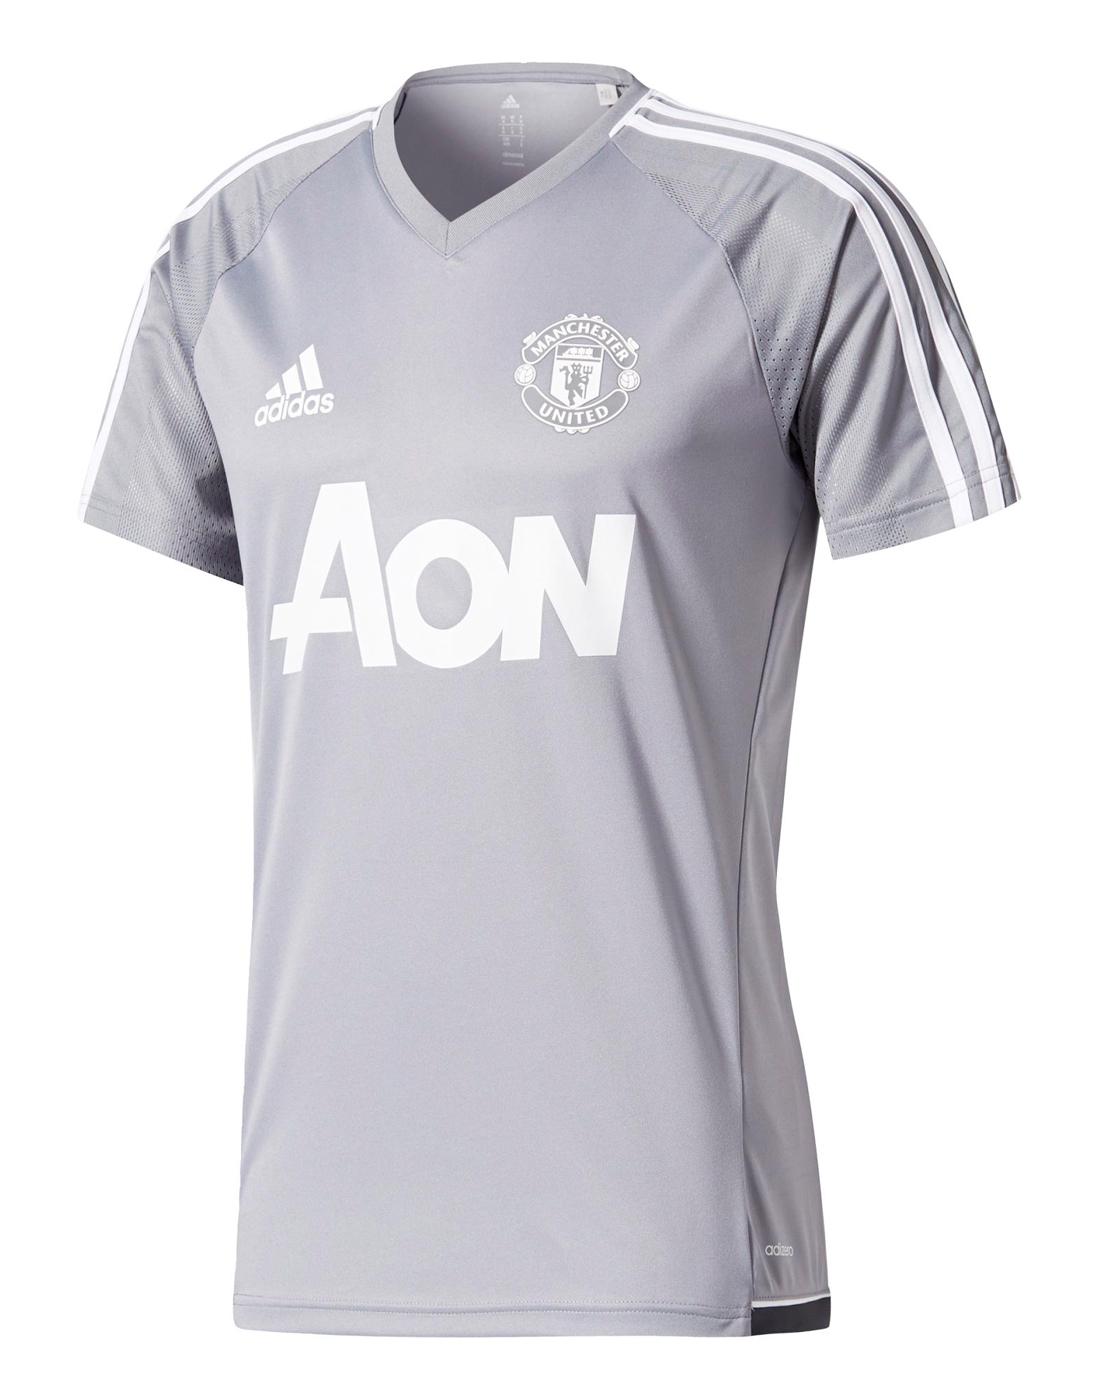 6fddf5c55 adidas Adult Man Utd 17 18 Training Jersey